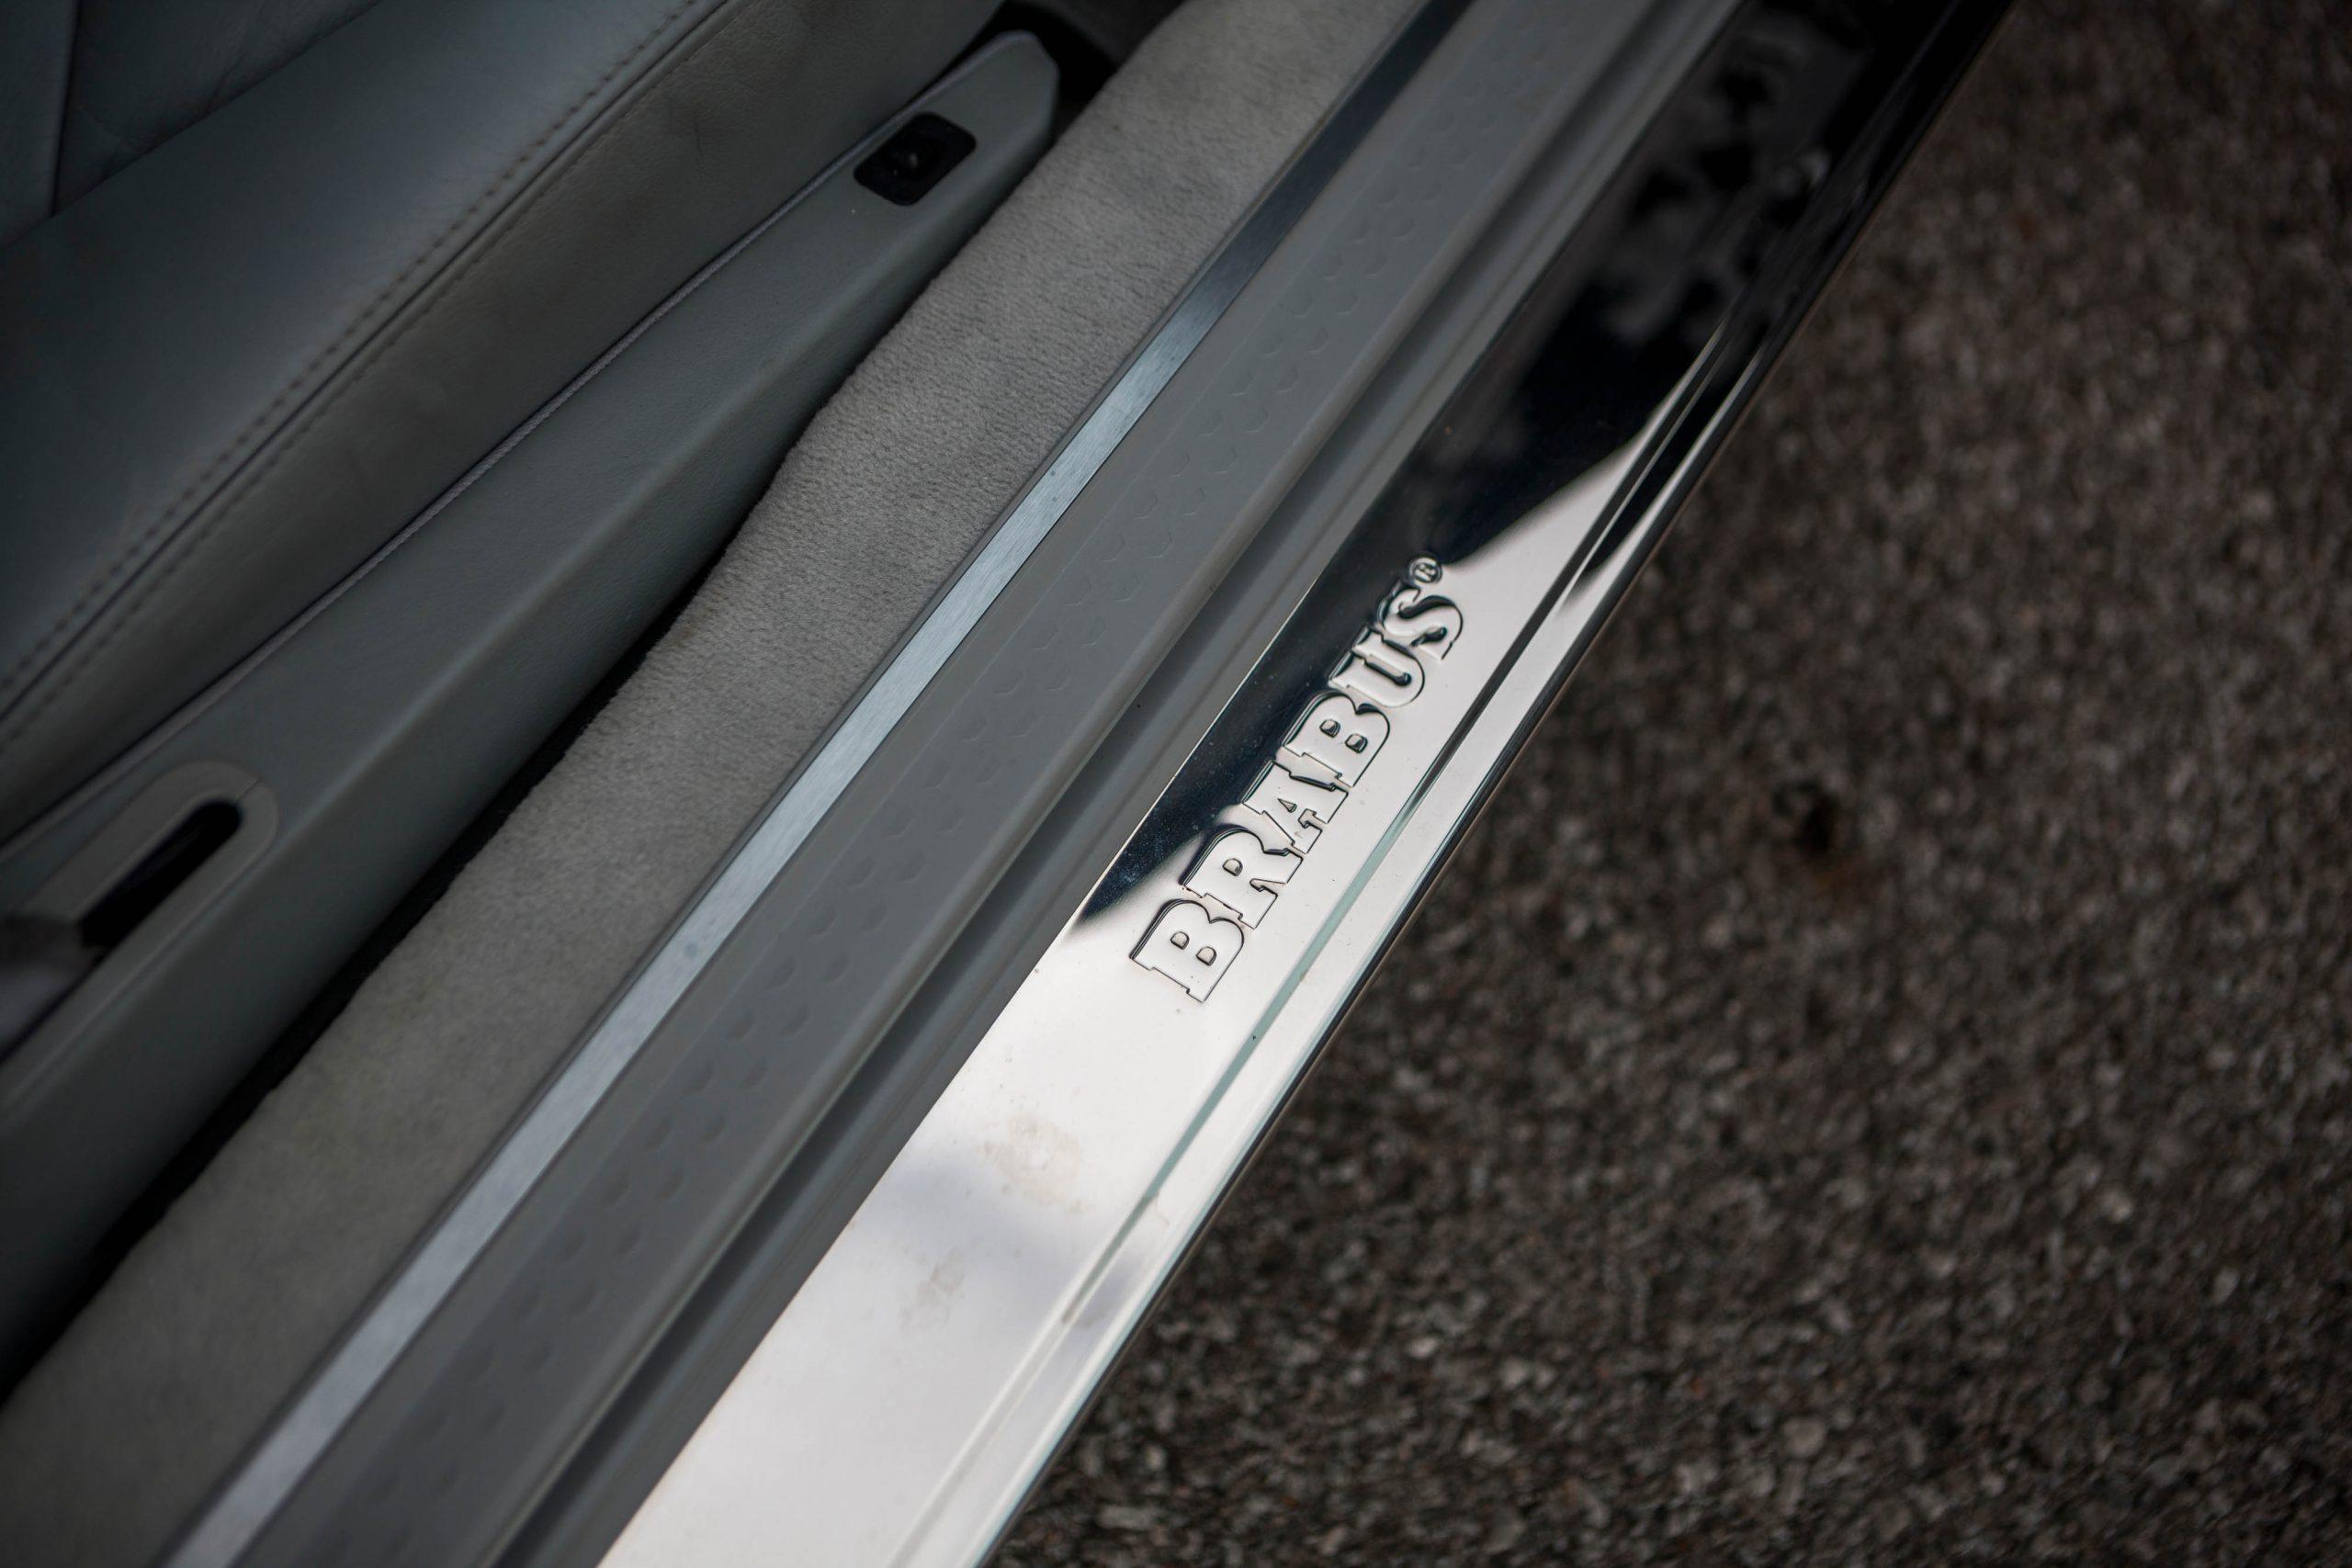 1999 Mercedes-Benz Brabus 7.3 S sill